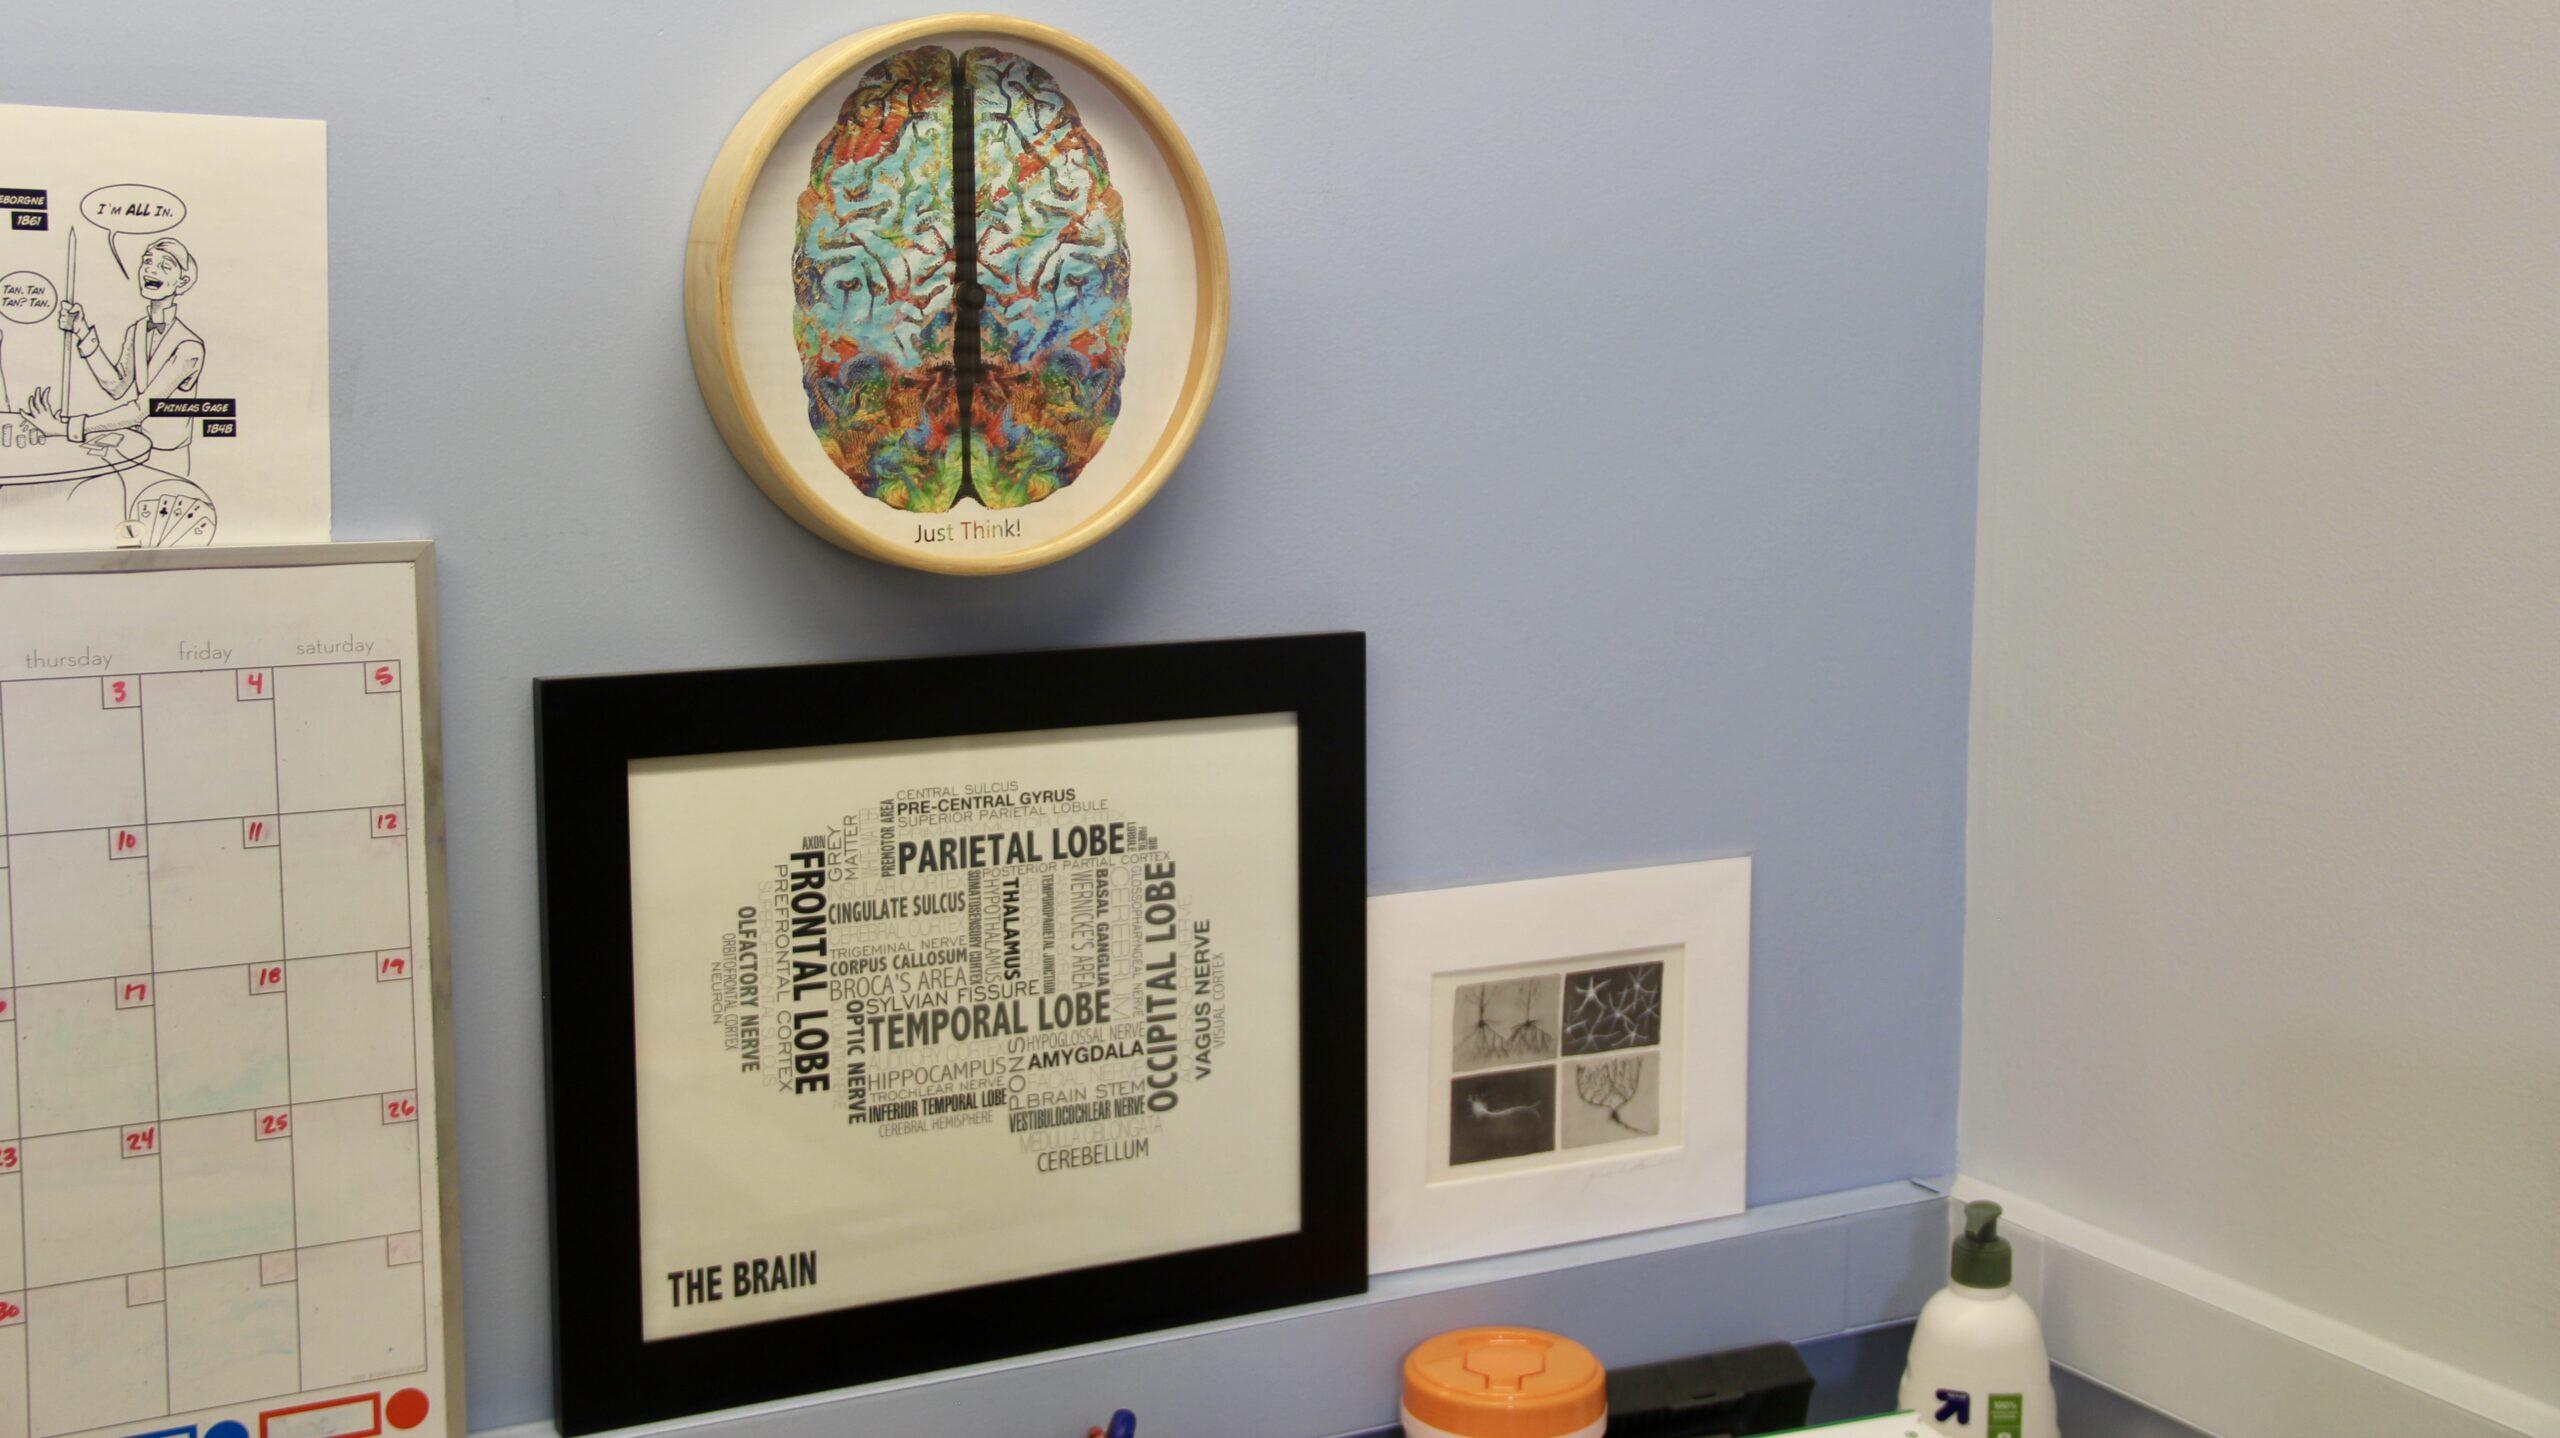 a brain clock and word cloud shaped like a brain